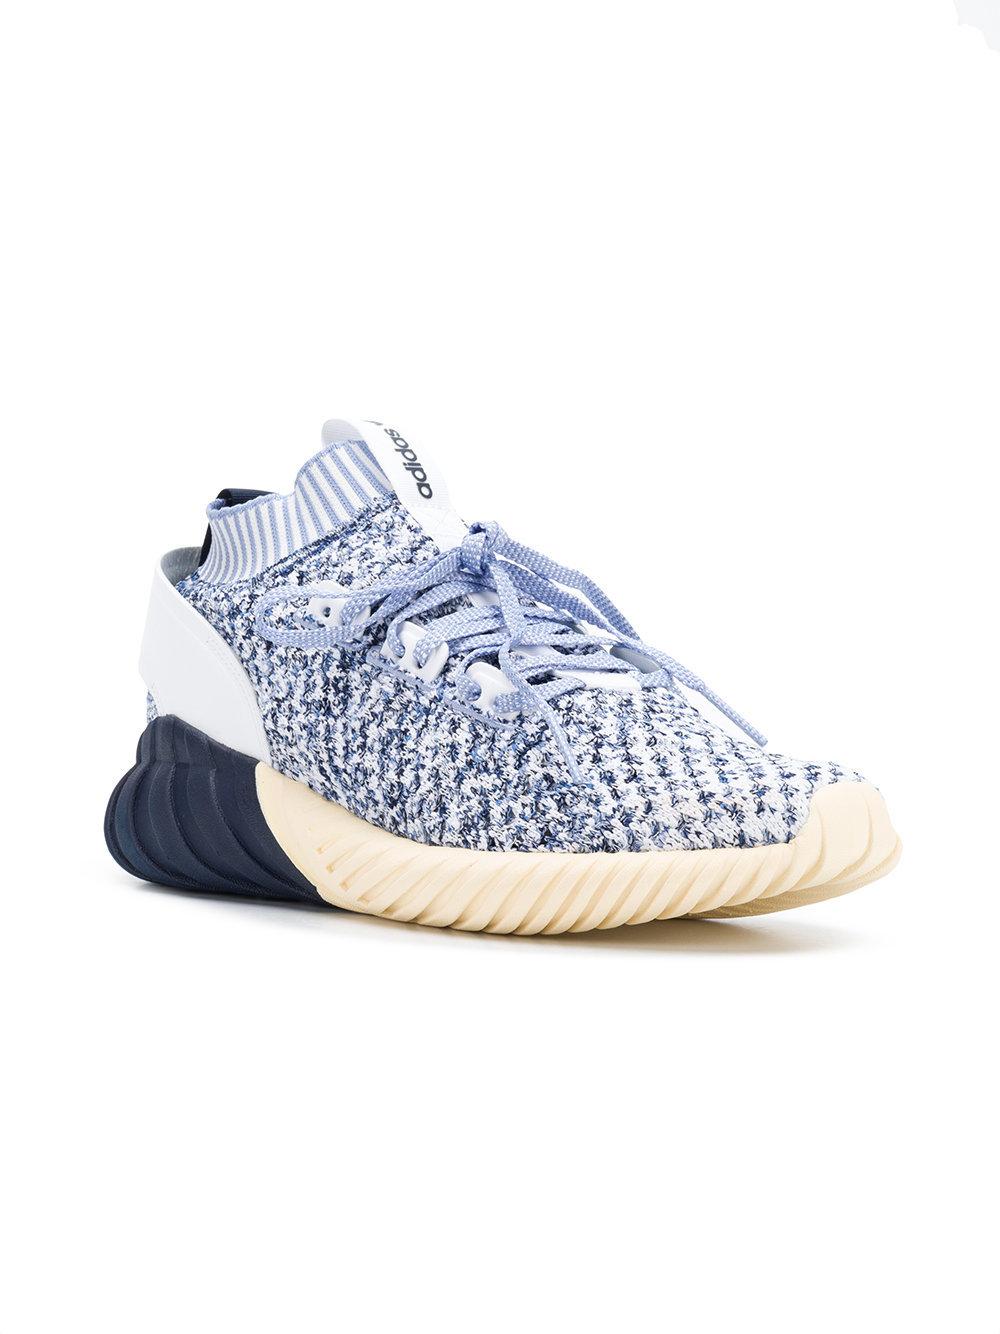 pretty nice 11503 4a8ac $161, adidas Originals Tubular Doom Sock Primeknit Sneakers